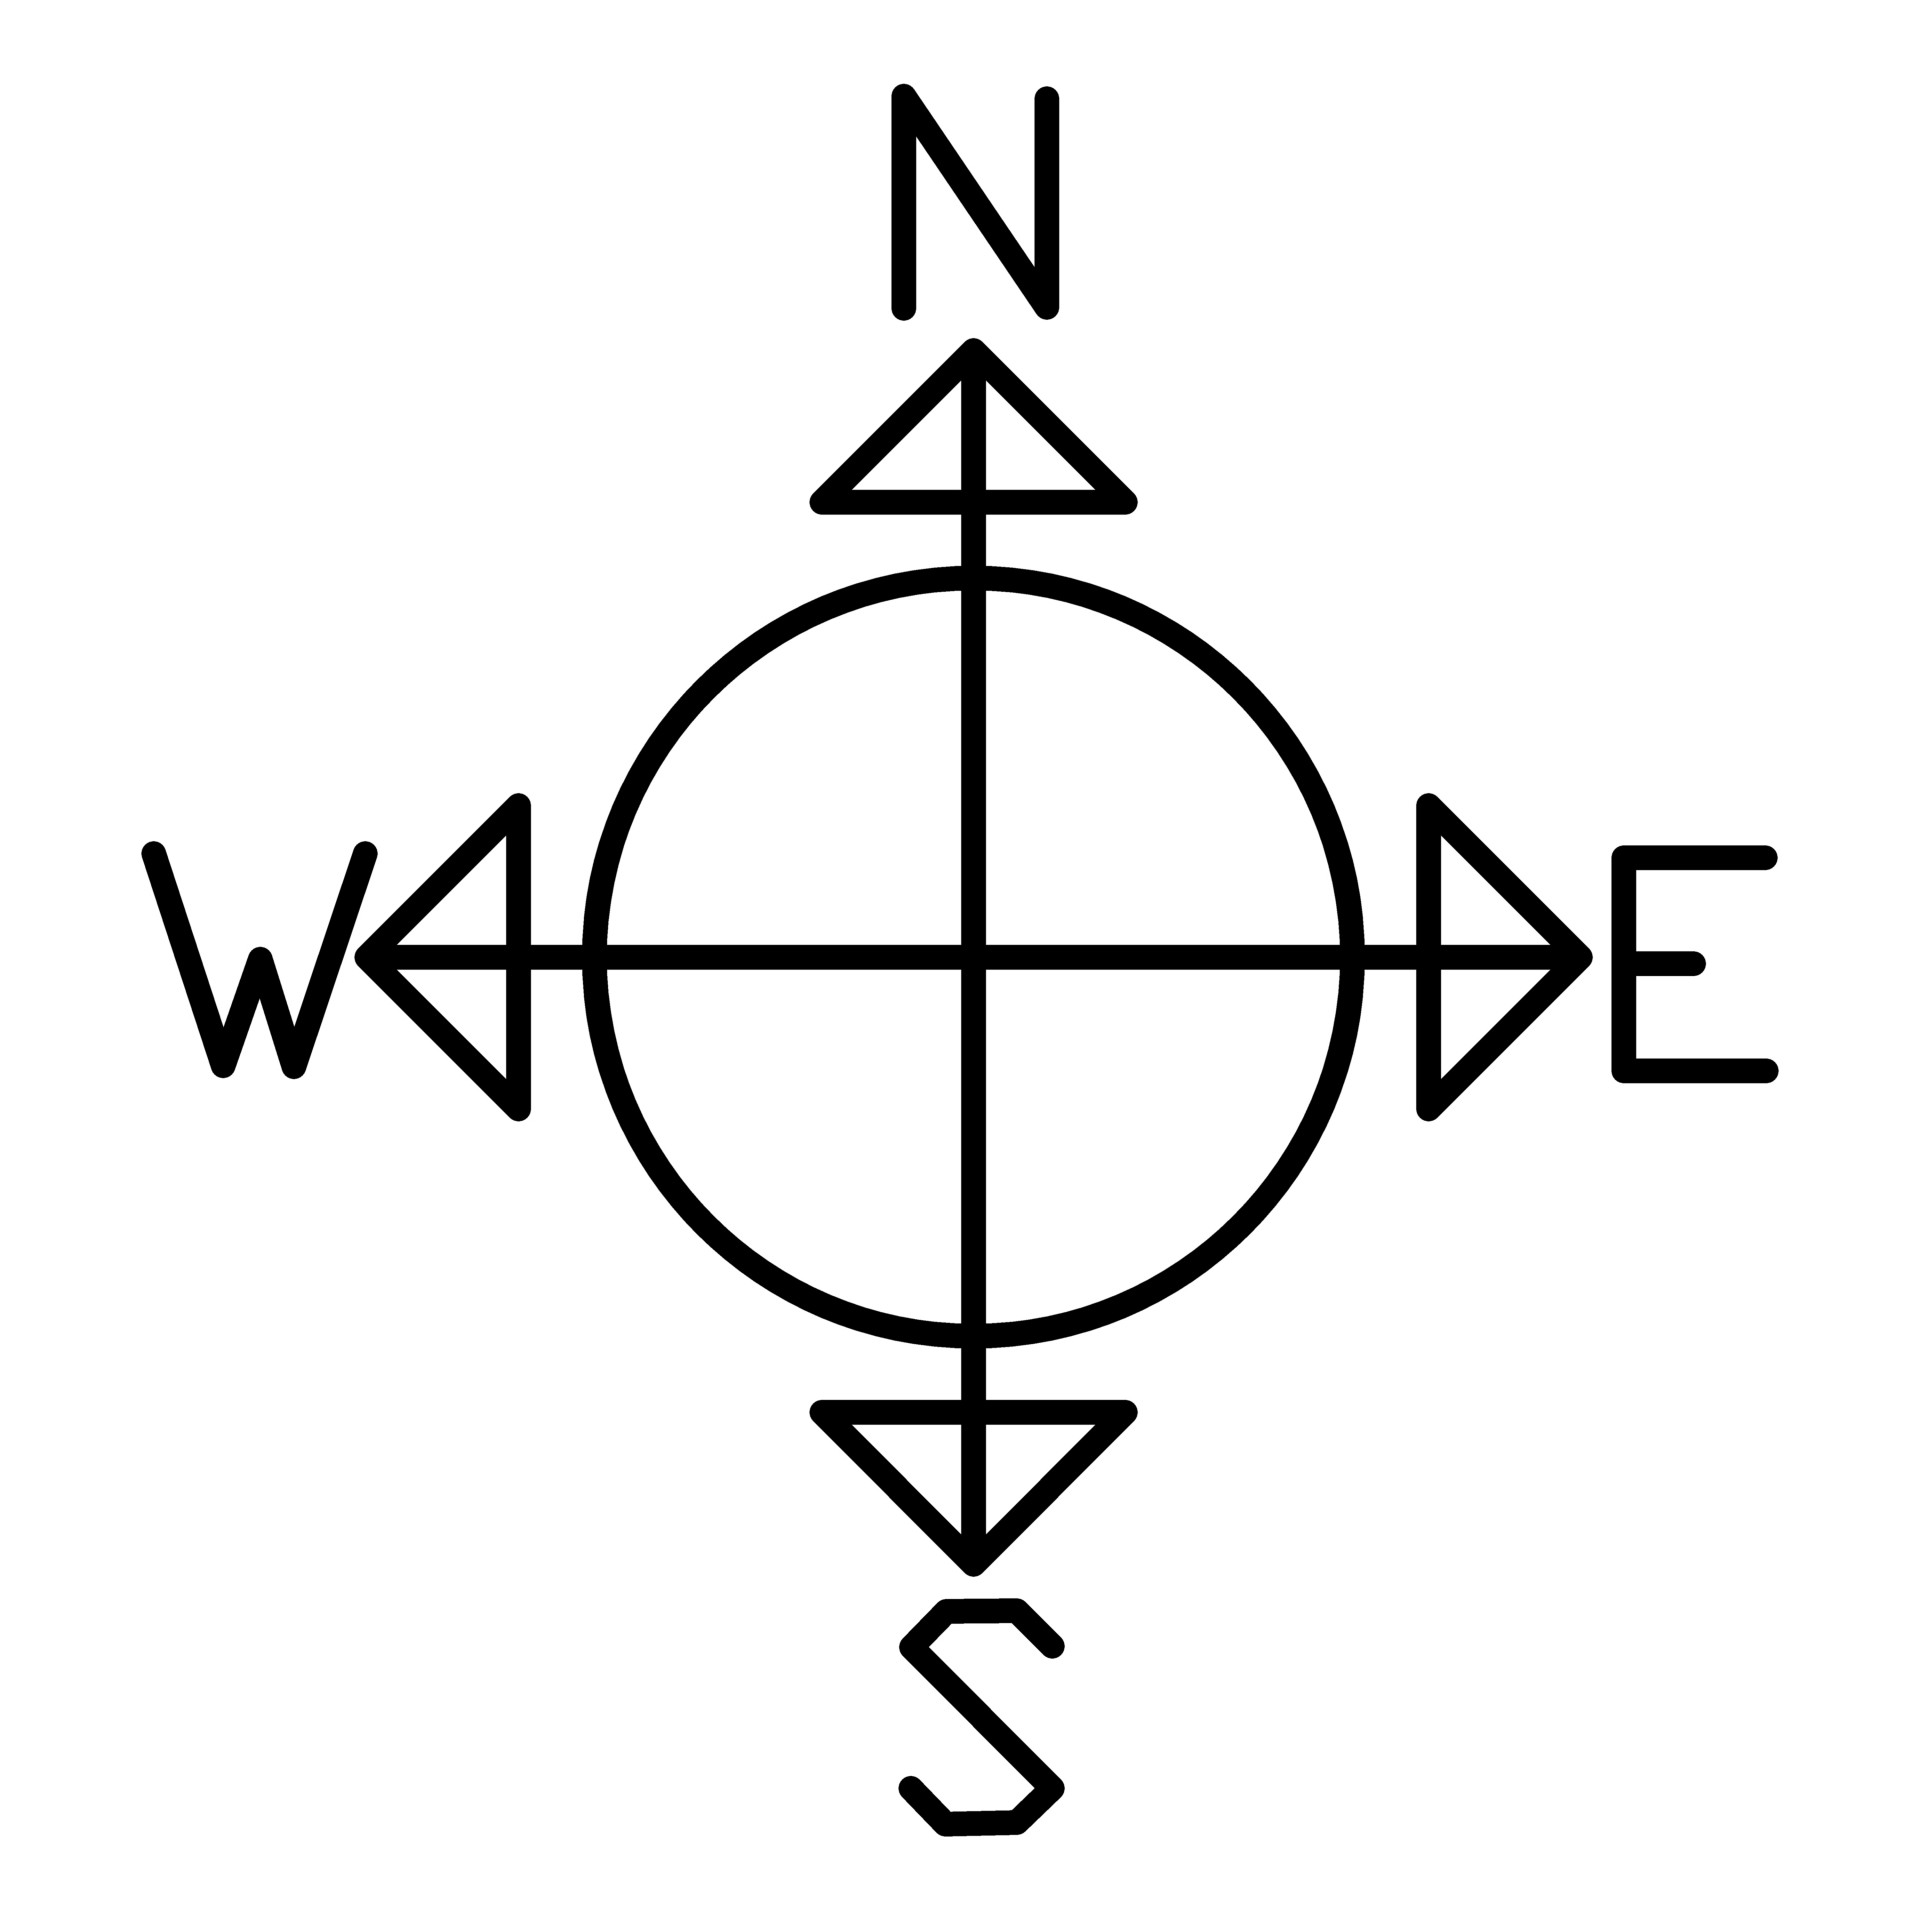 Compass Silhouette Free Stock Photo